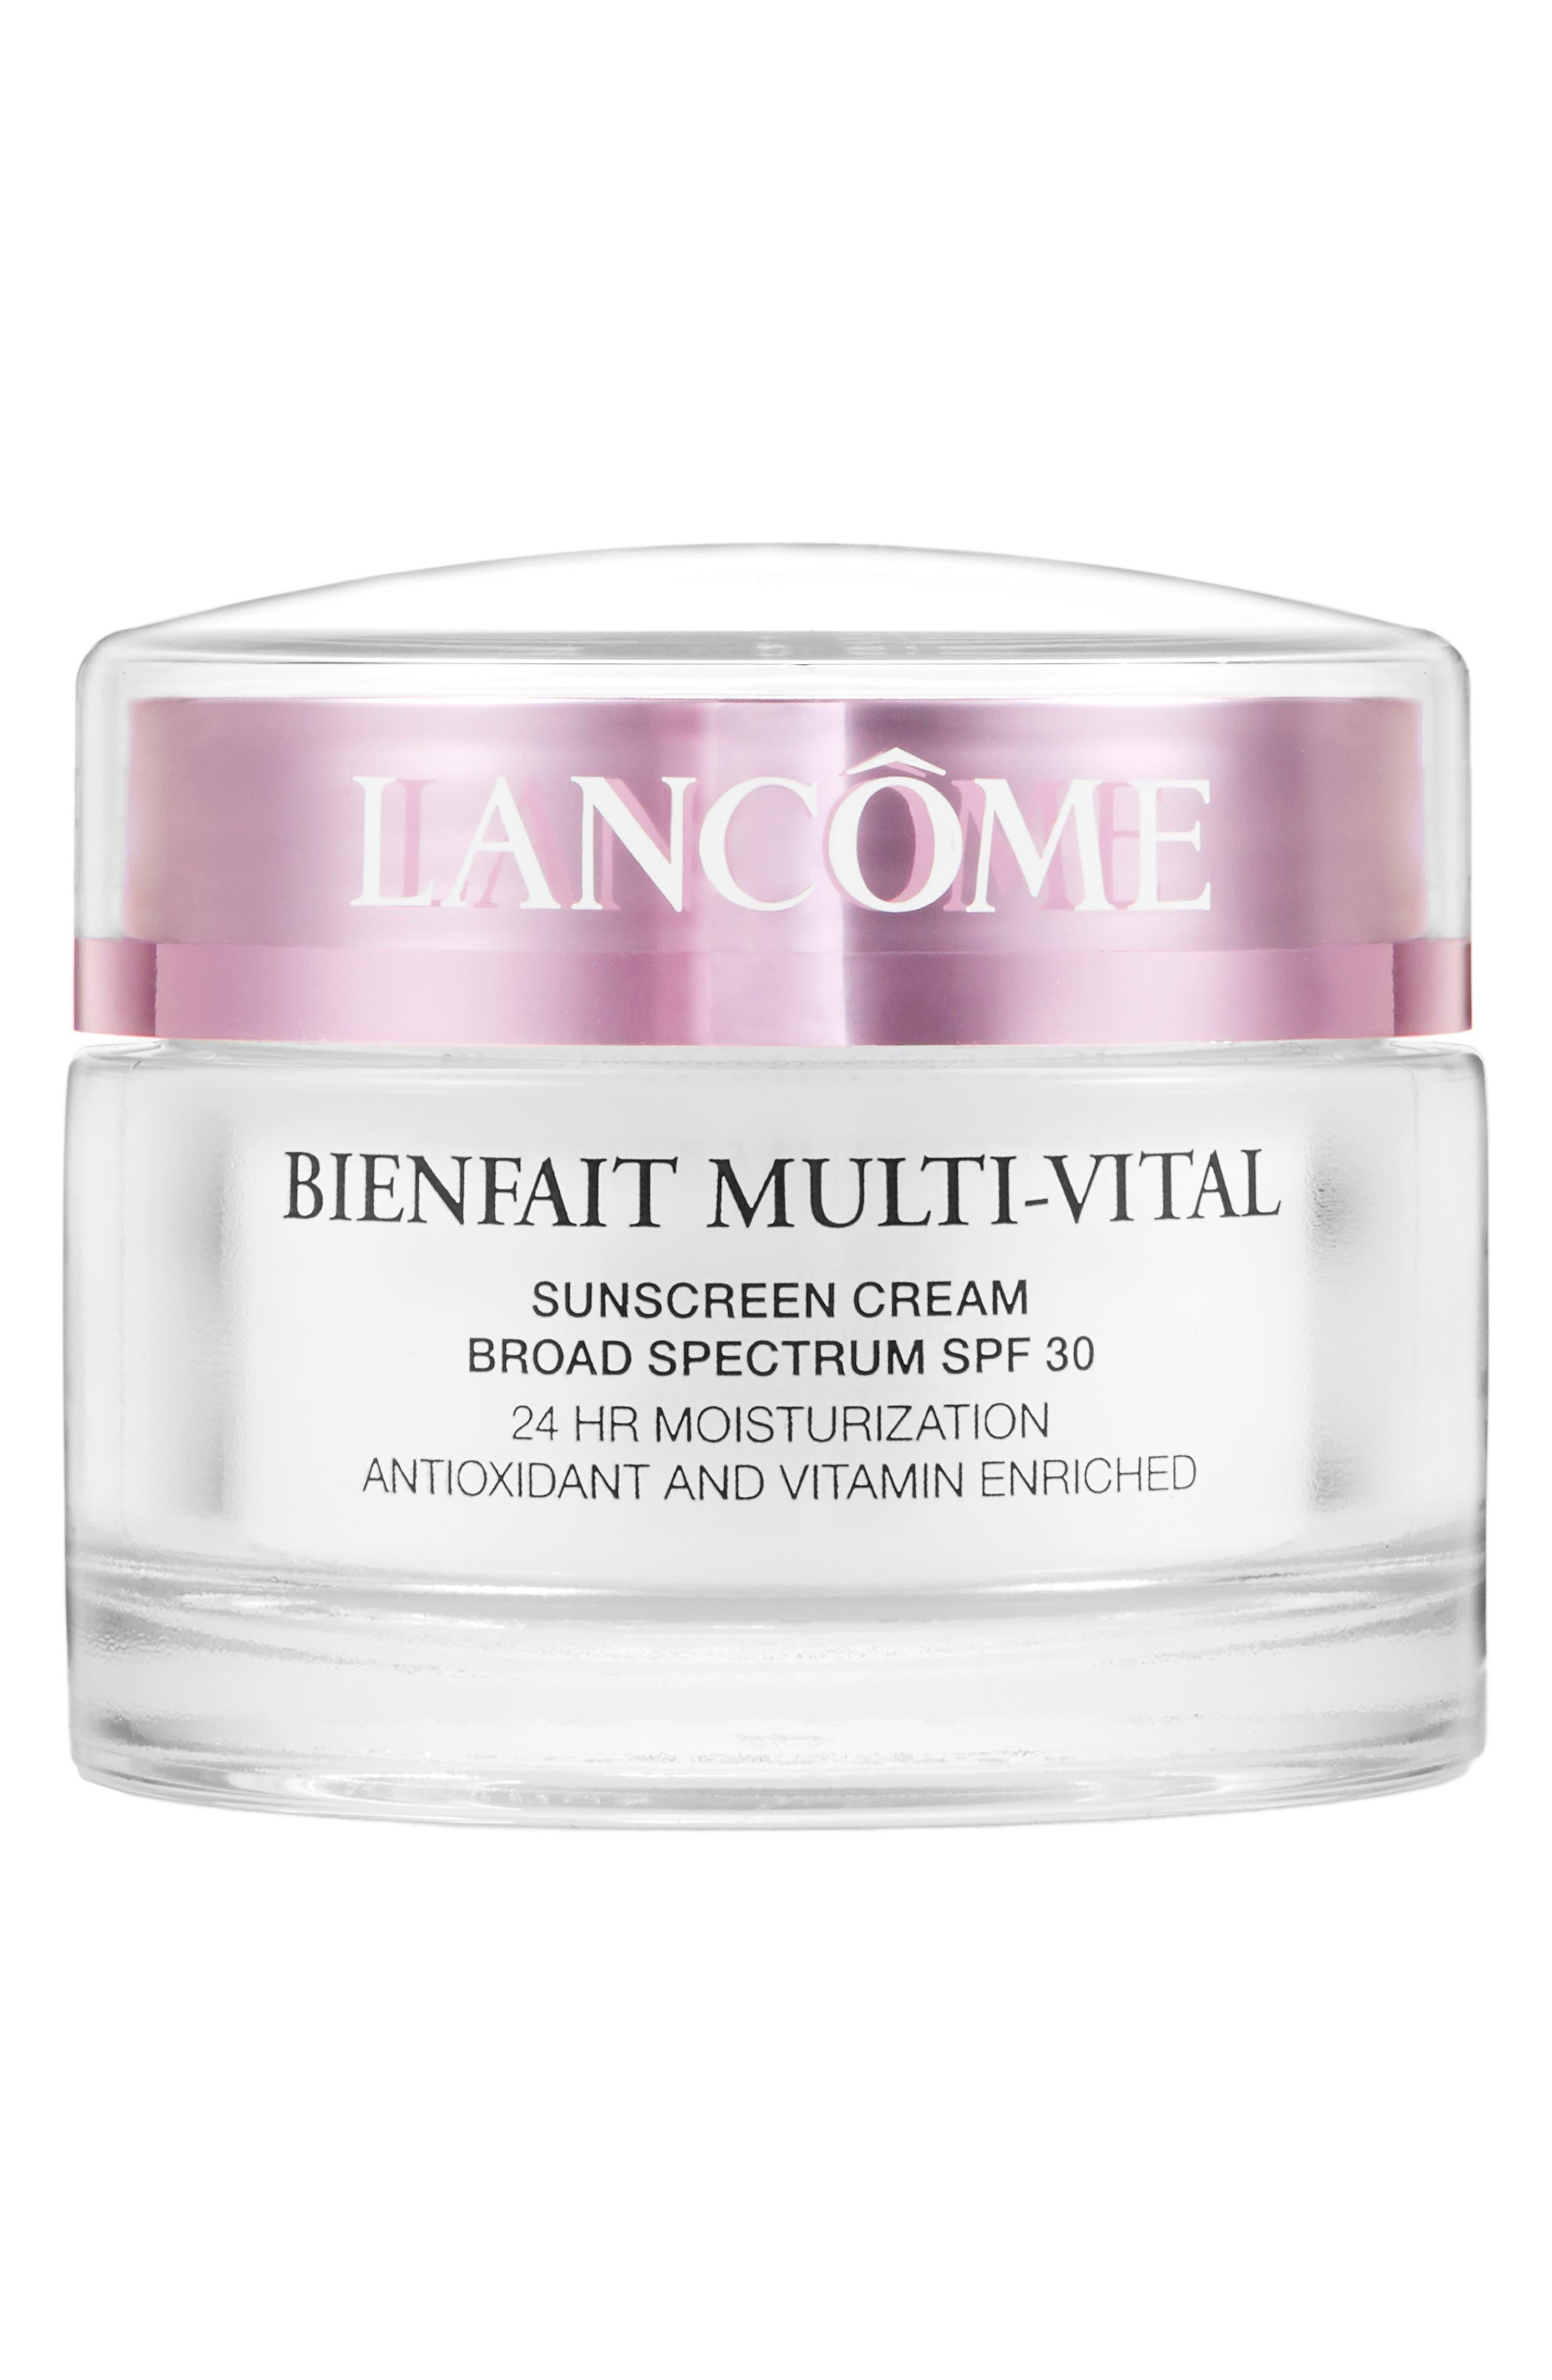 Lancome Bienfait Multi-Vital Spf 30 Day Cream Moisturizer